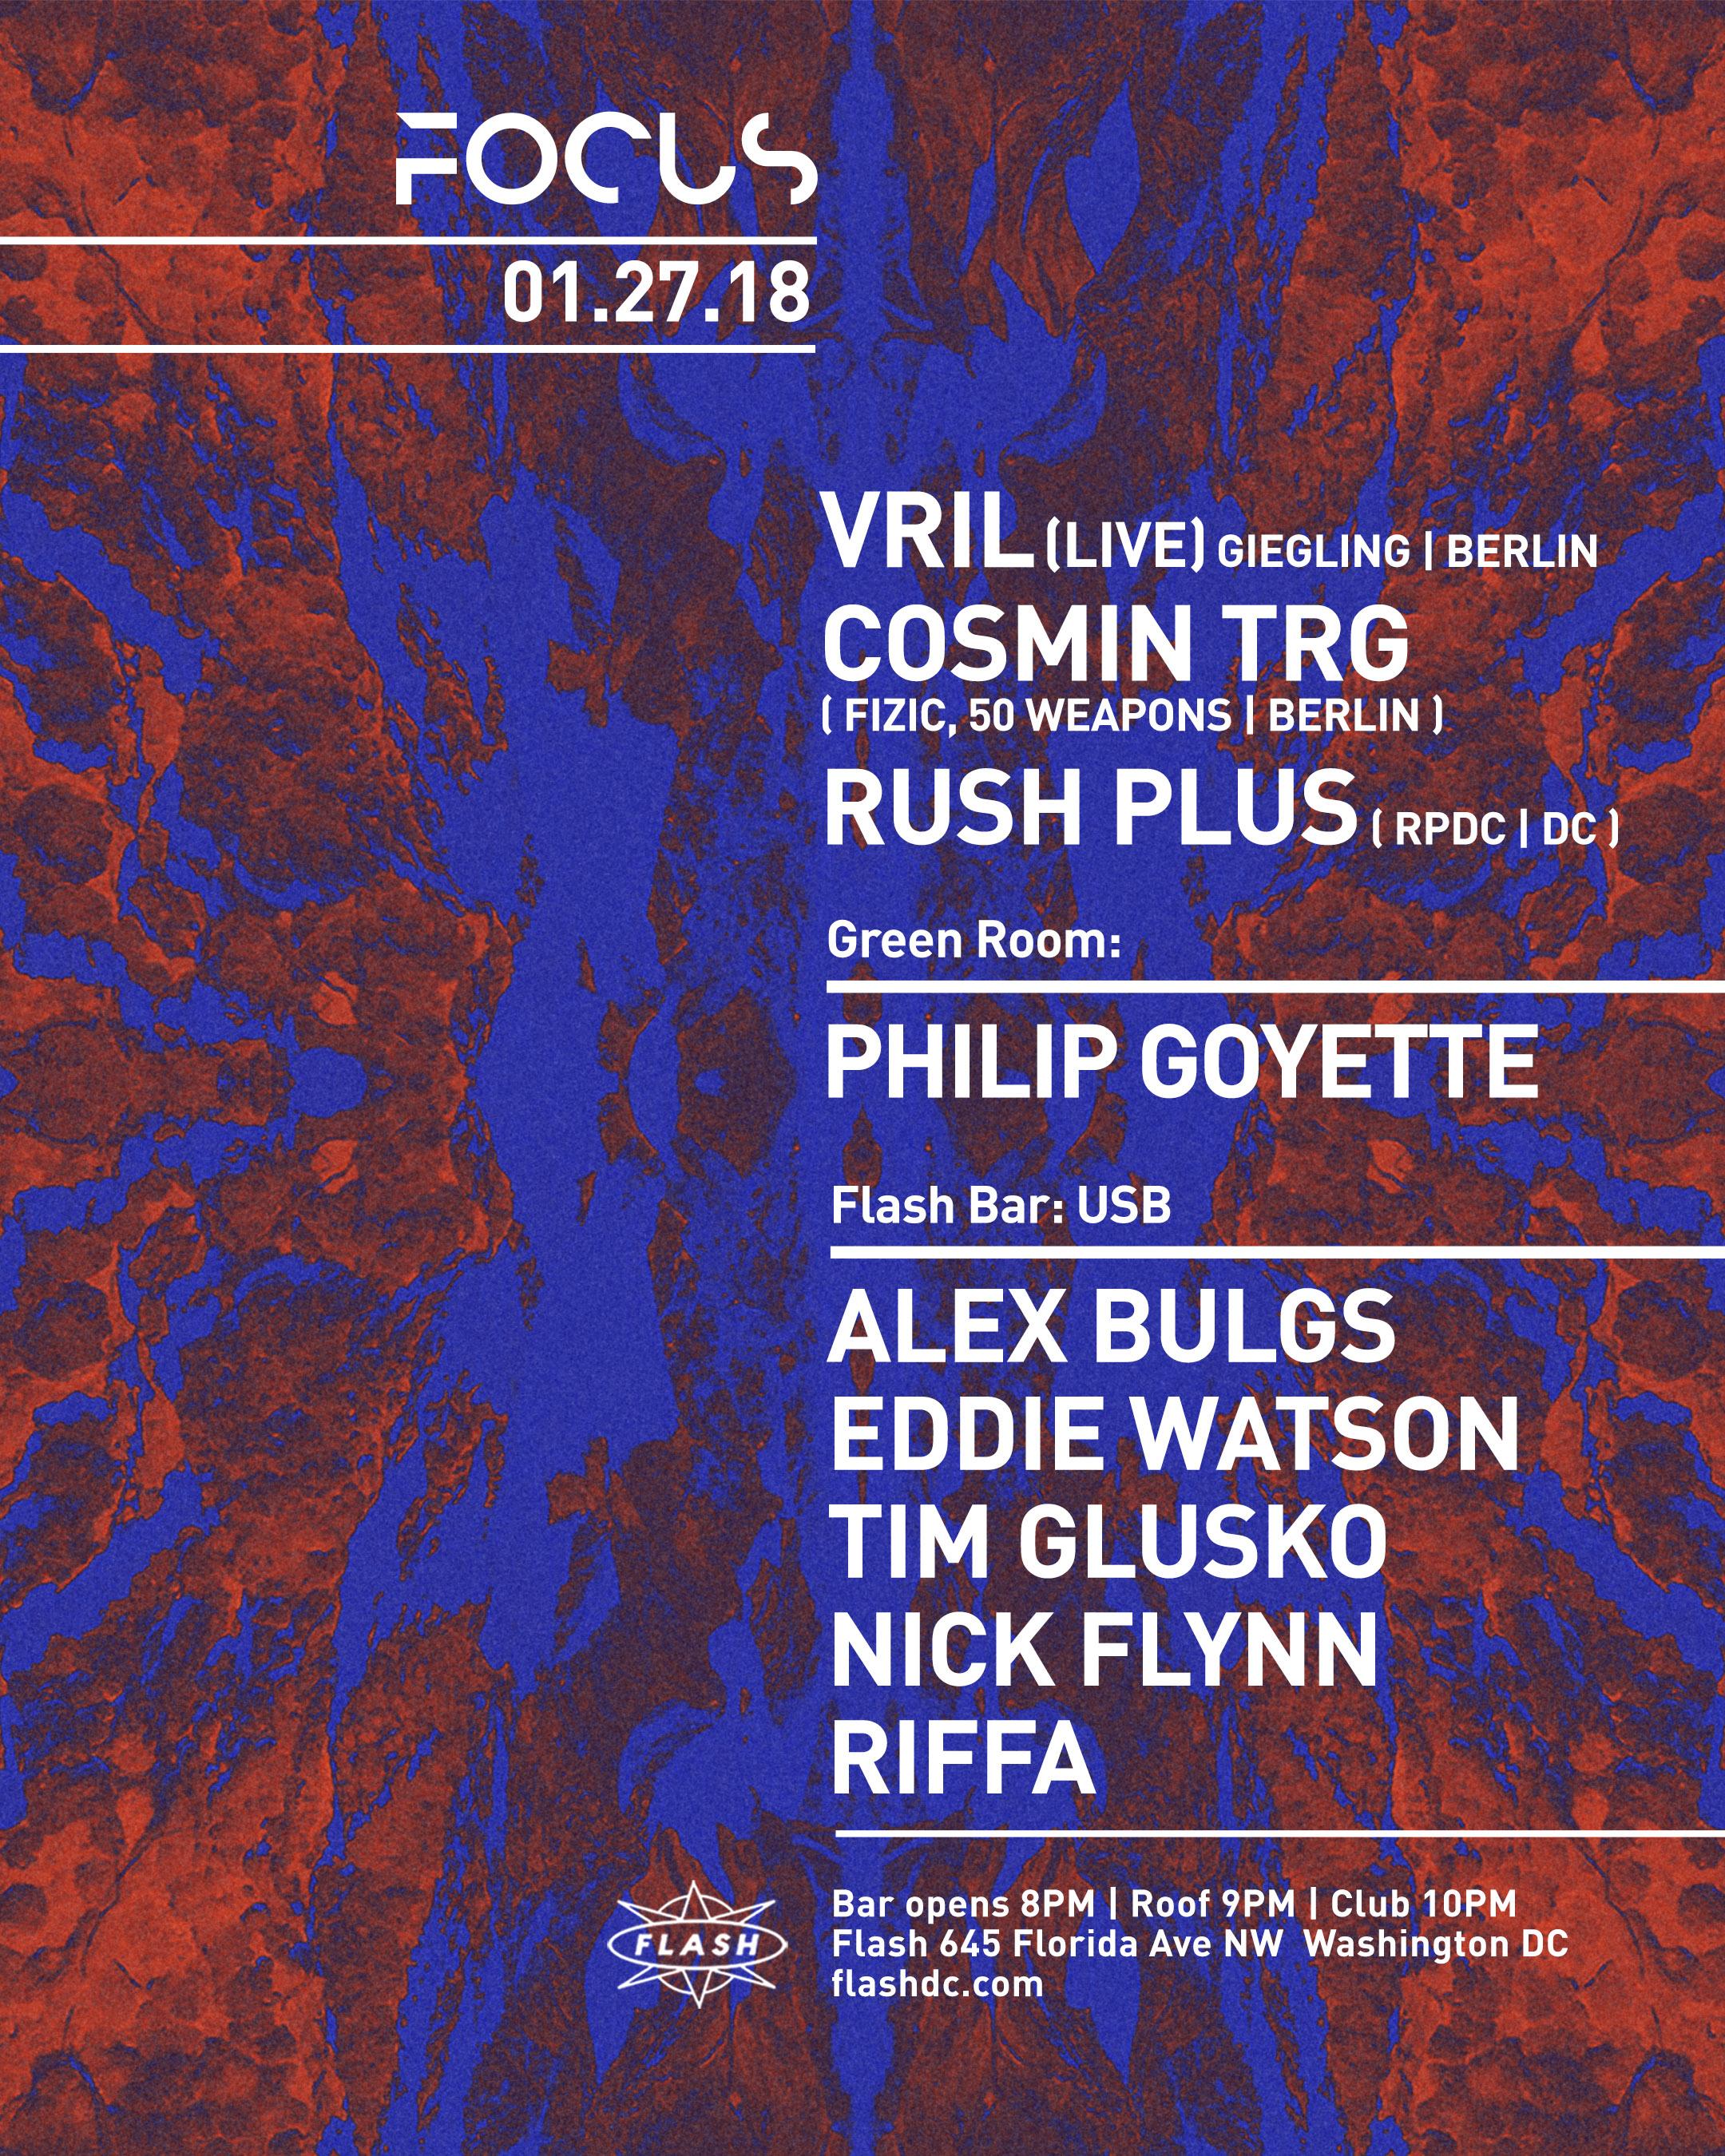 FOCUS: Vril [LiVE] - Cosmin TRG event thumbnail